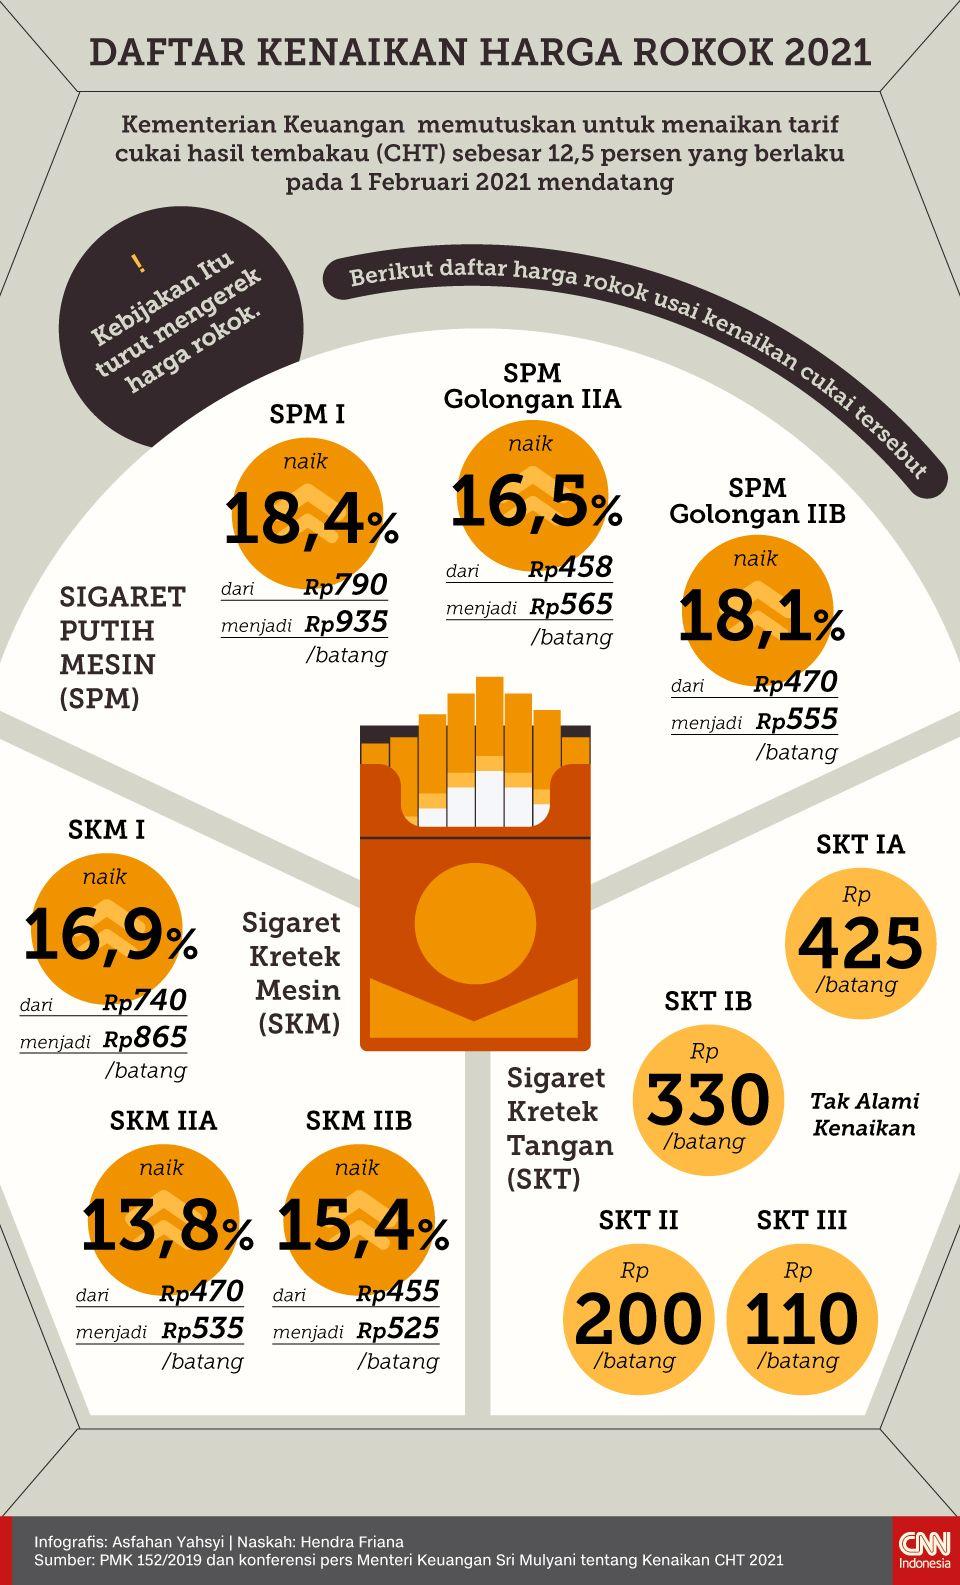 Infografis Daftar Kenaikan Harga Rokok 2021